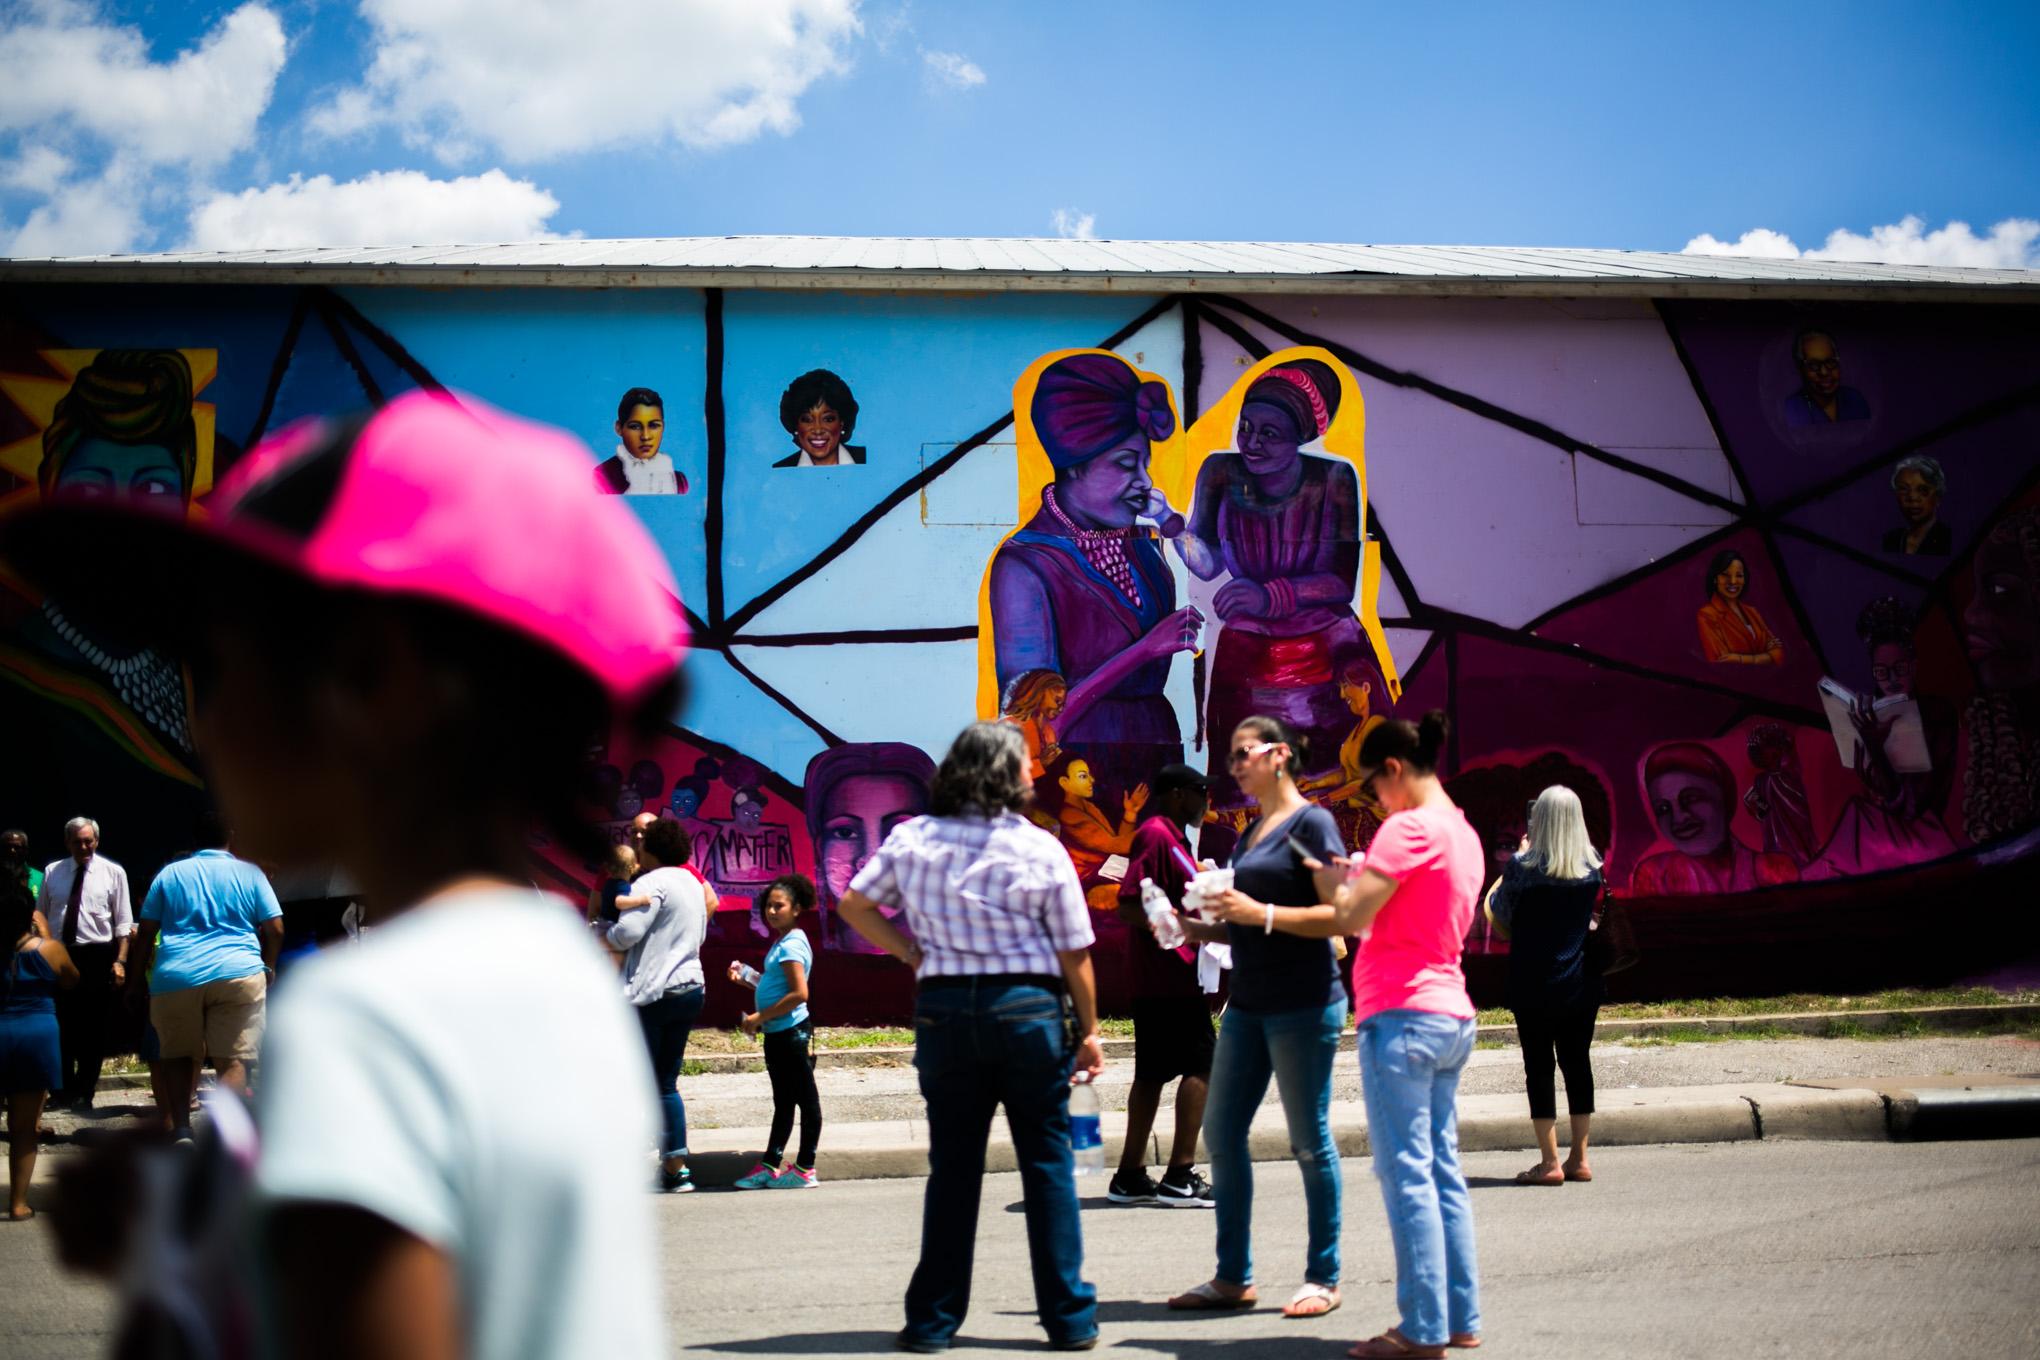 The mural is on 2603 E. Houston St. and features women like Ethel Minor, Ella Austin, Ruth Jones McClendon, Mayor Ivy Taylor, Artemisia Bowden, and Myra Davis Hemmings. Photo by Kathryn Boyd-Batstone.